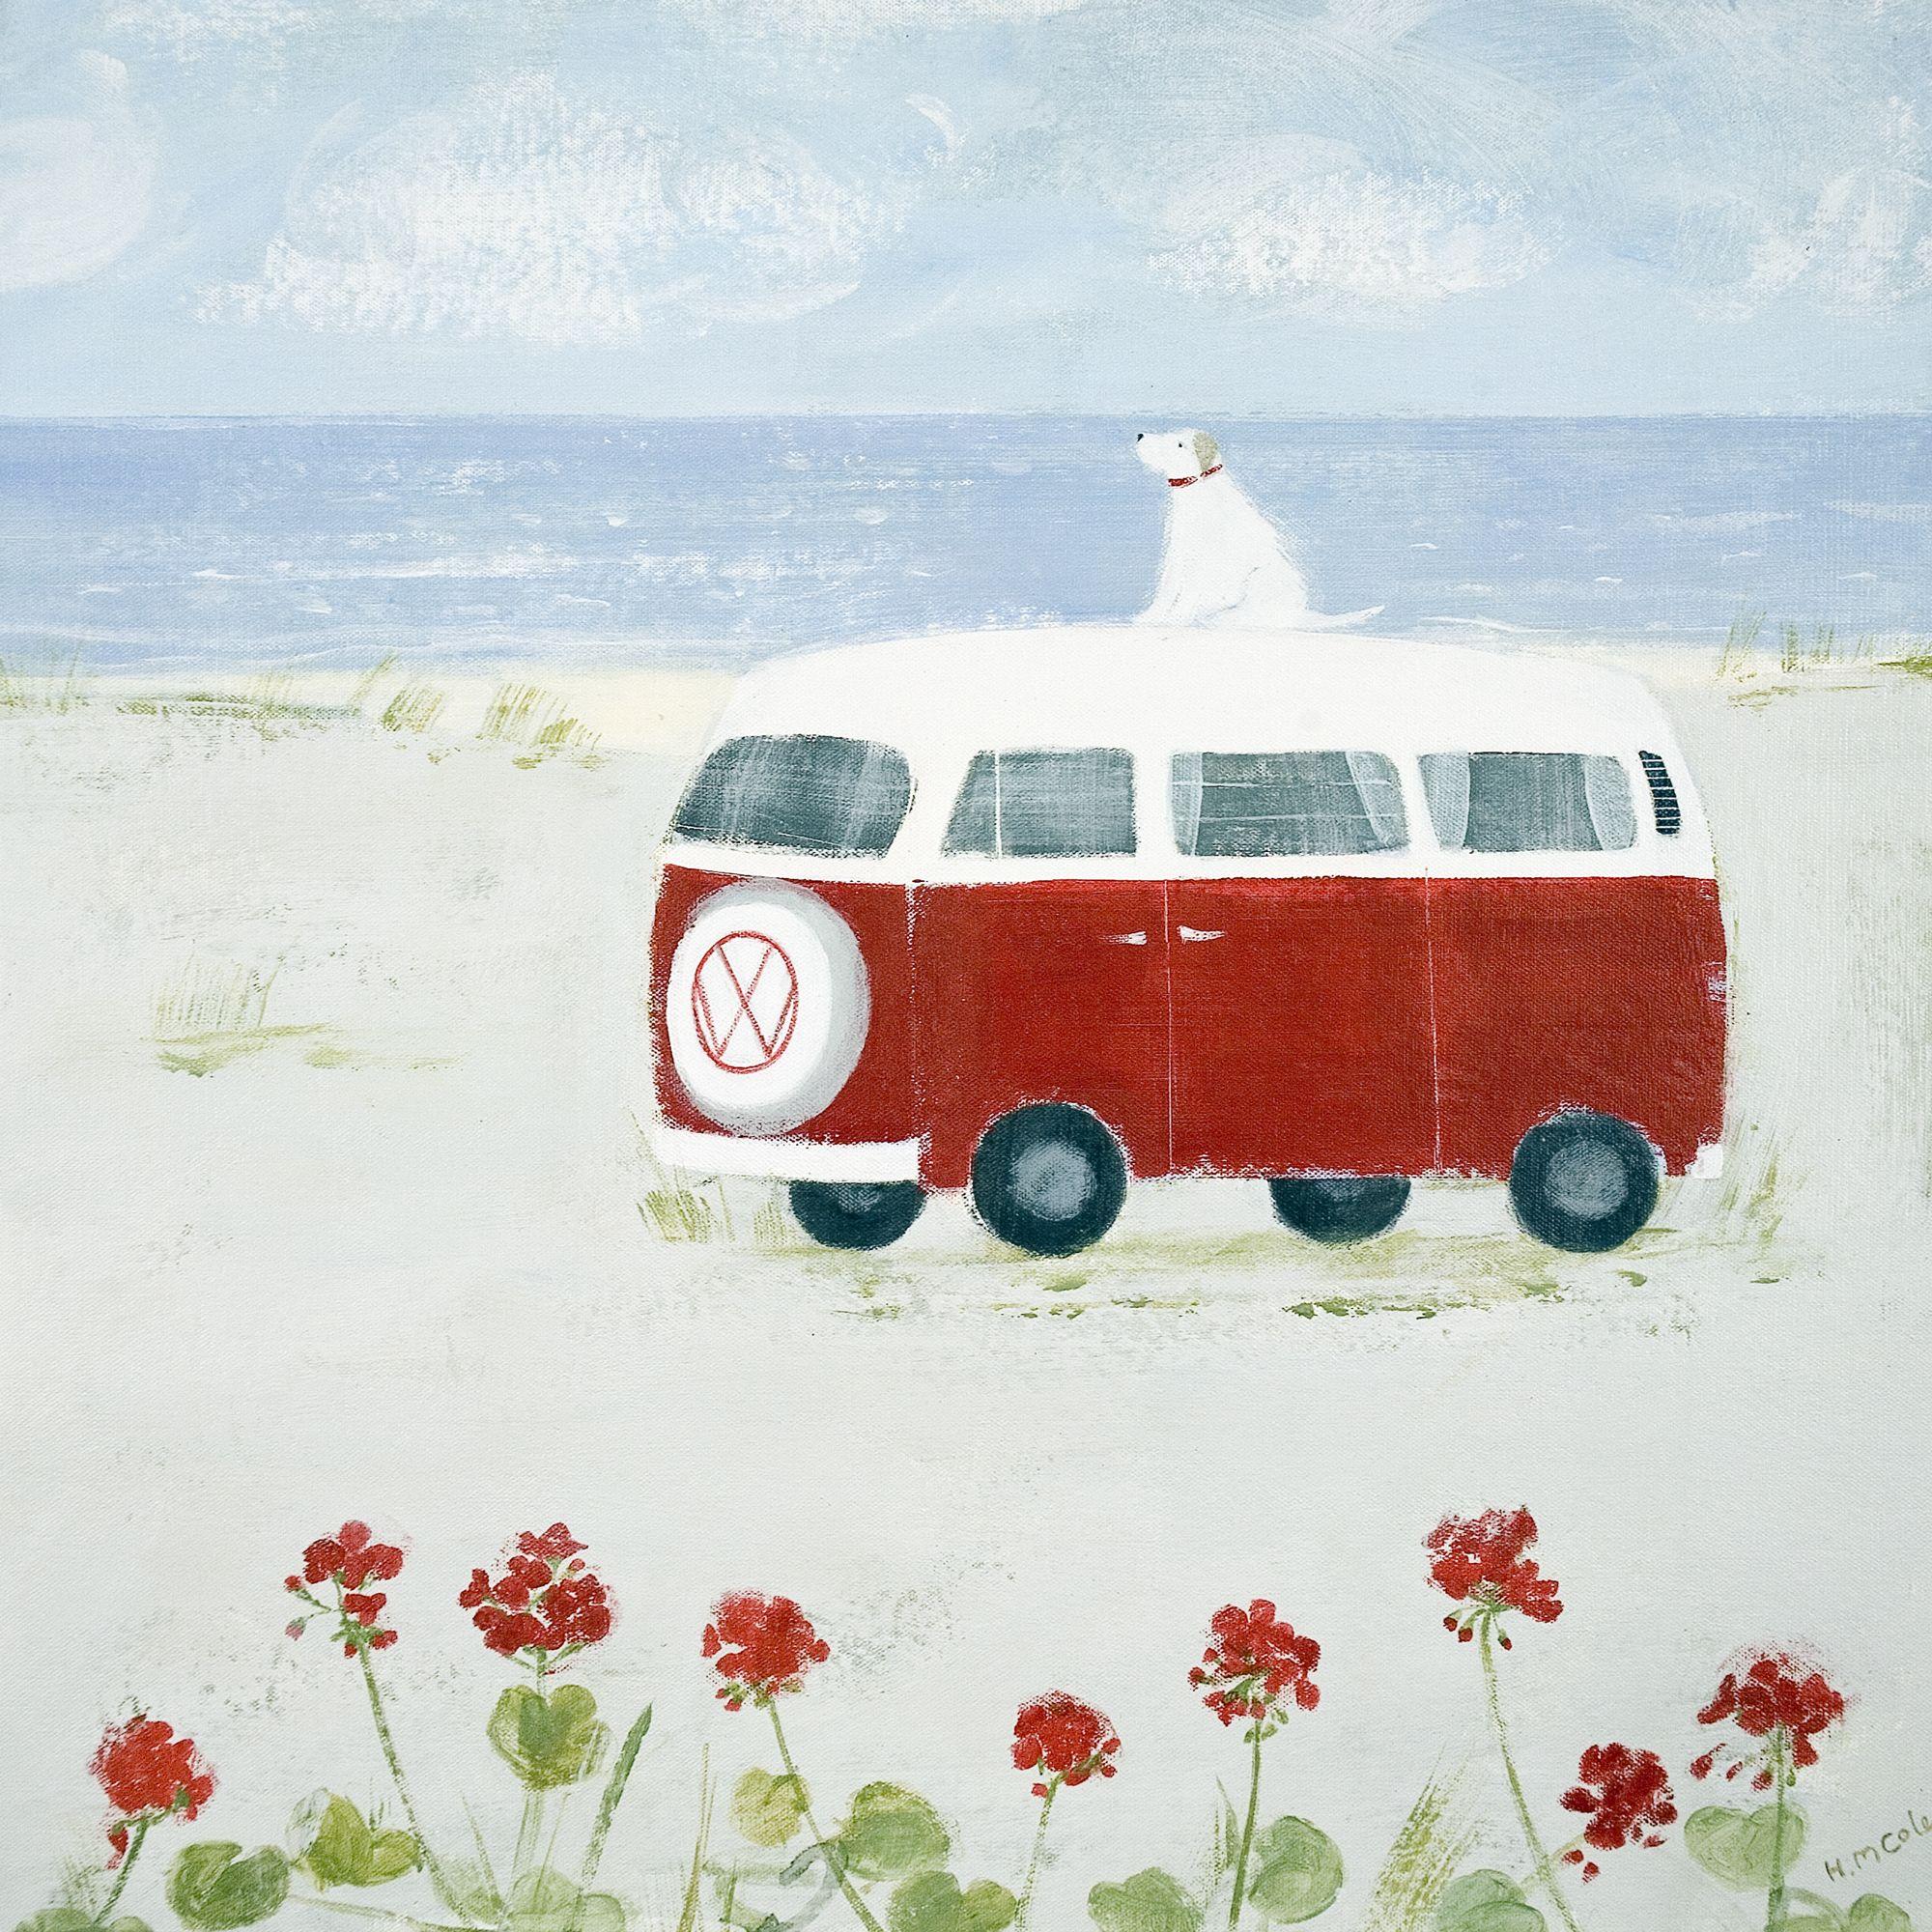 Red camper w277 beach coastal greetings card by hannah cole http red camper w277 beach coastal greetings card by hannah cole http kristyandbryce Gallery